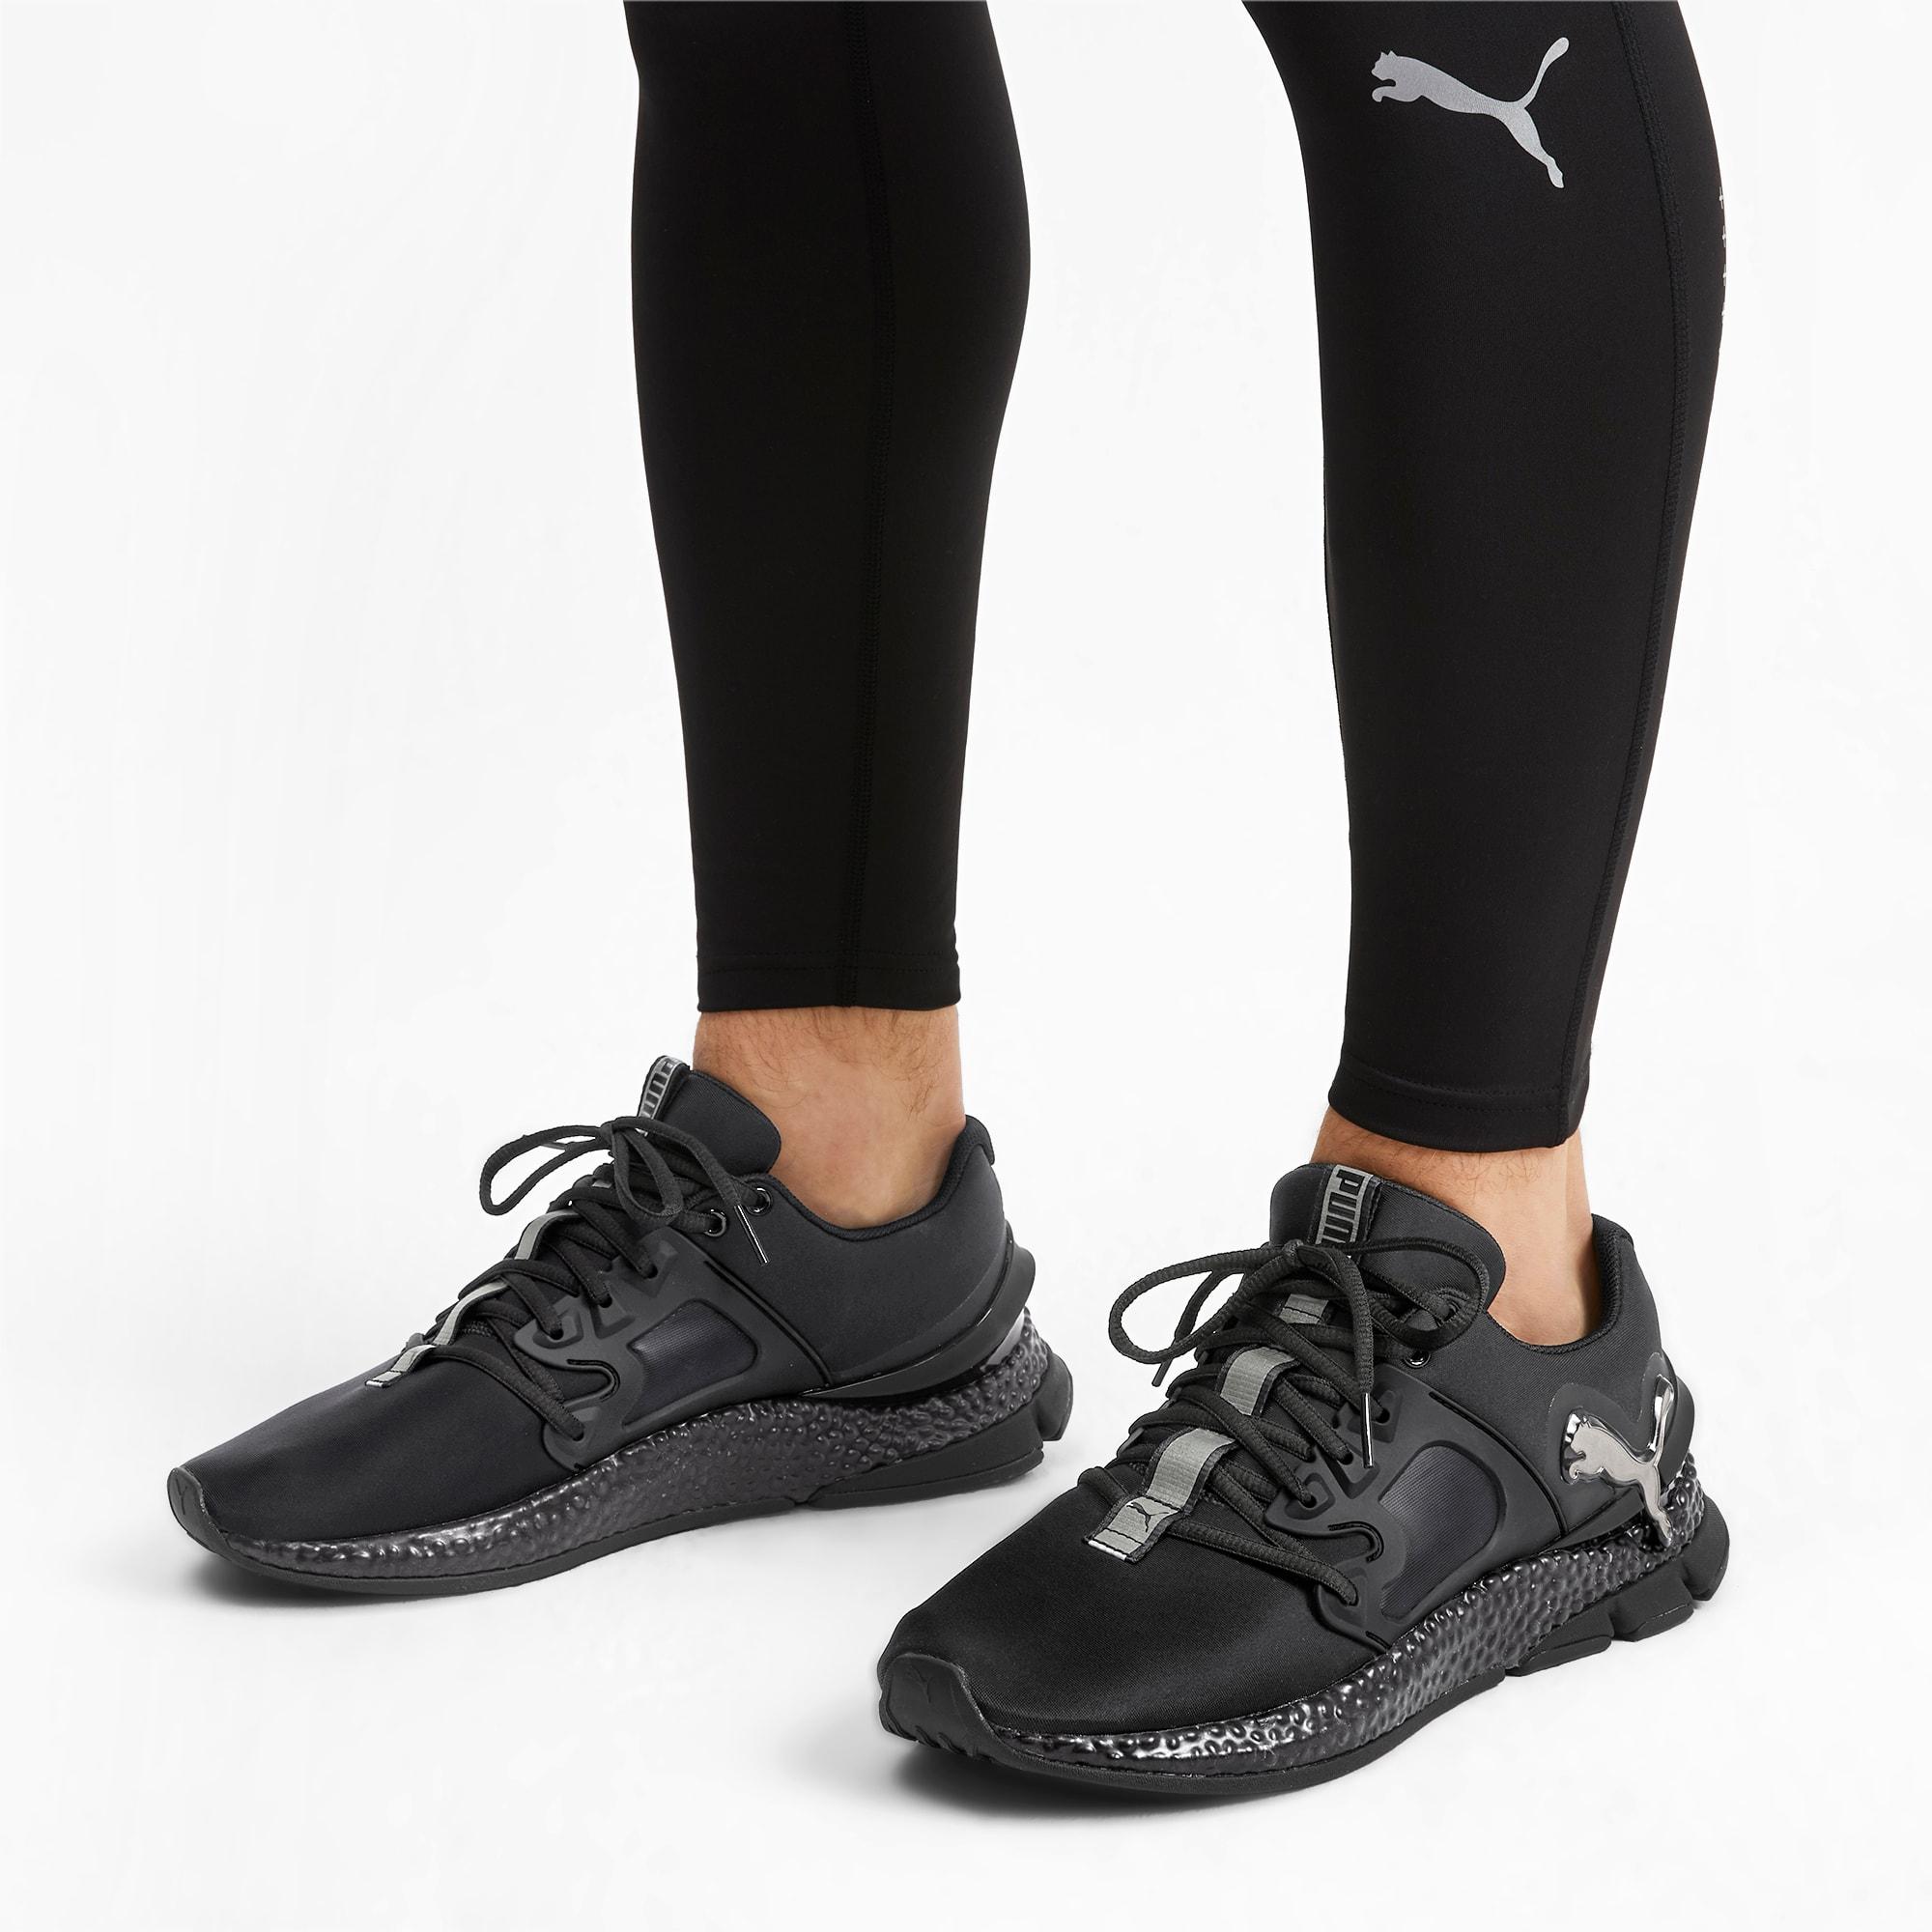 Zapatos para correr HYBRID Sky Ravede hombre